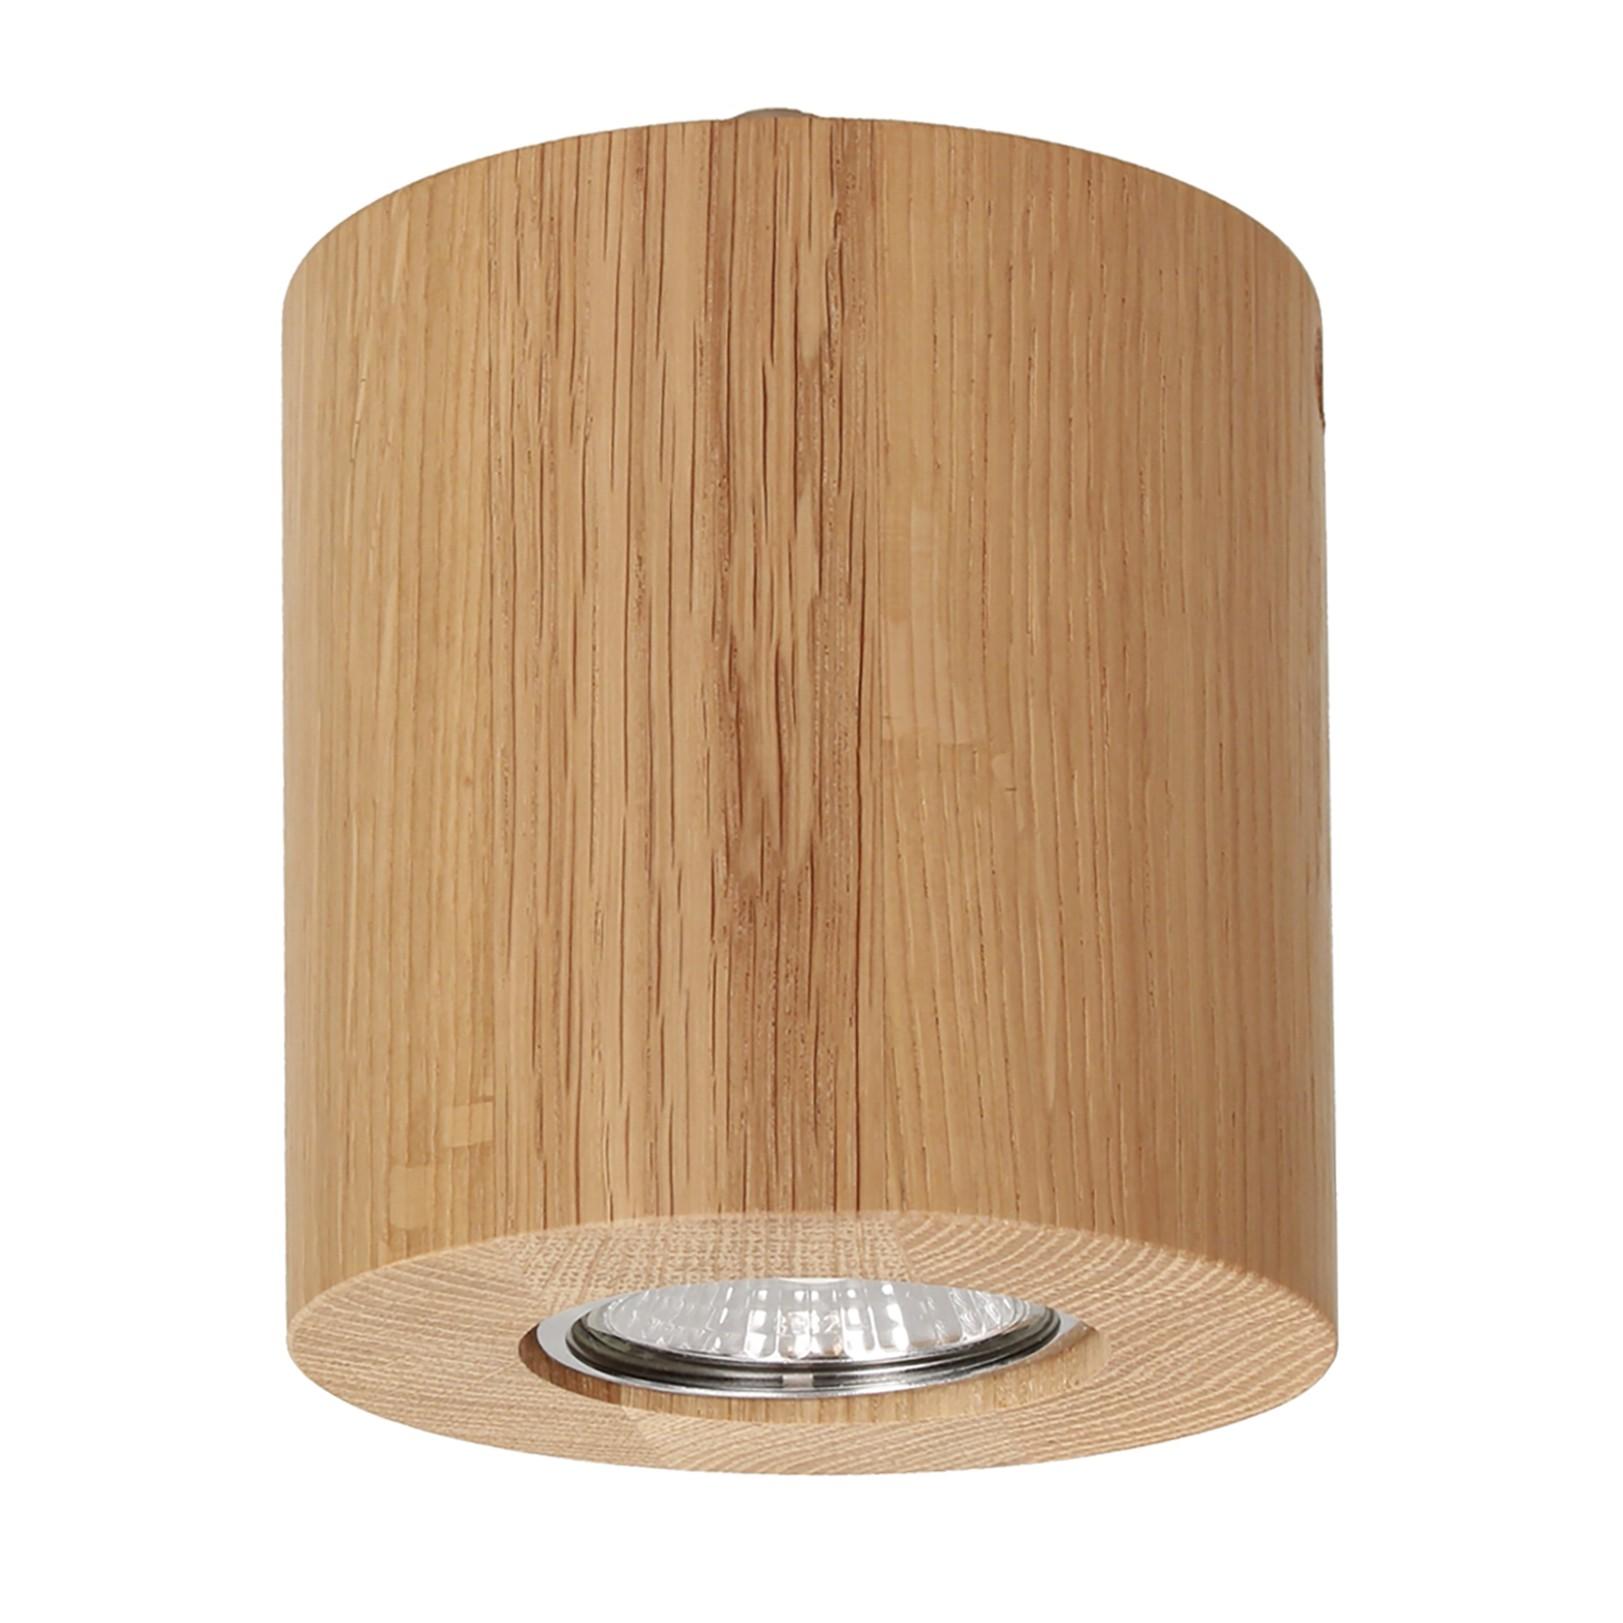 home24 LED-Deckenleuchte Wooddream III